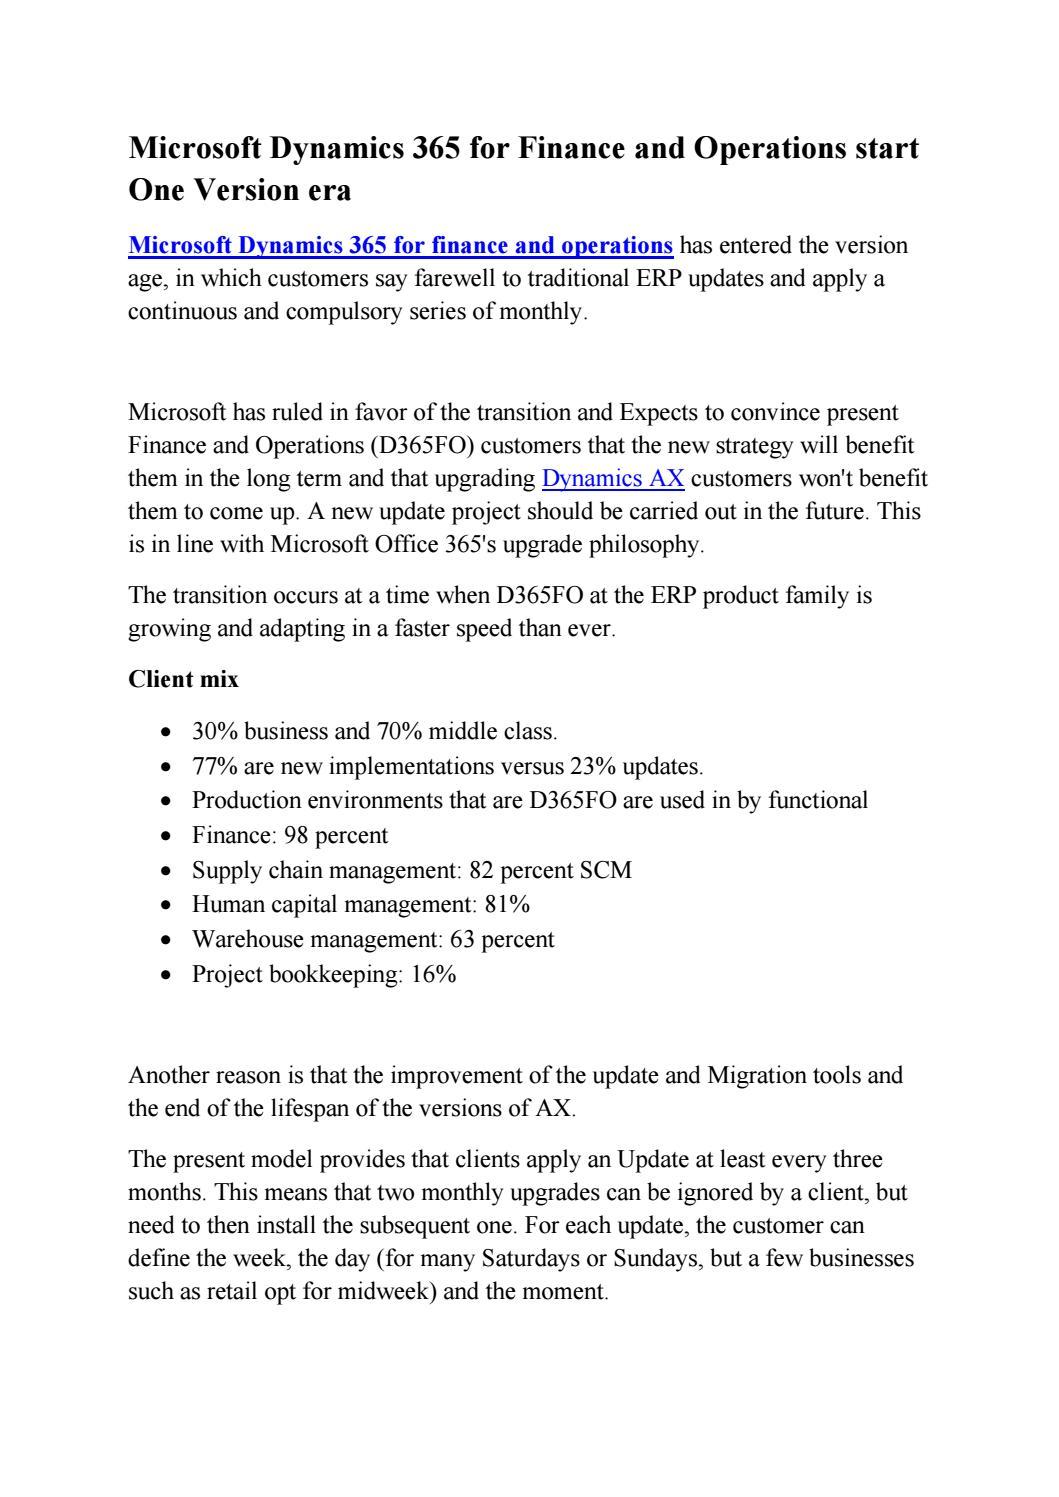 Microsoft Dynamics 365 For Finance And Operations Start One Version Era By Sunbridge India Issuu